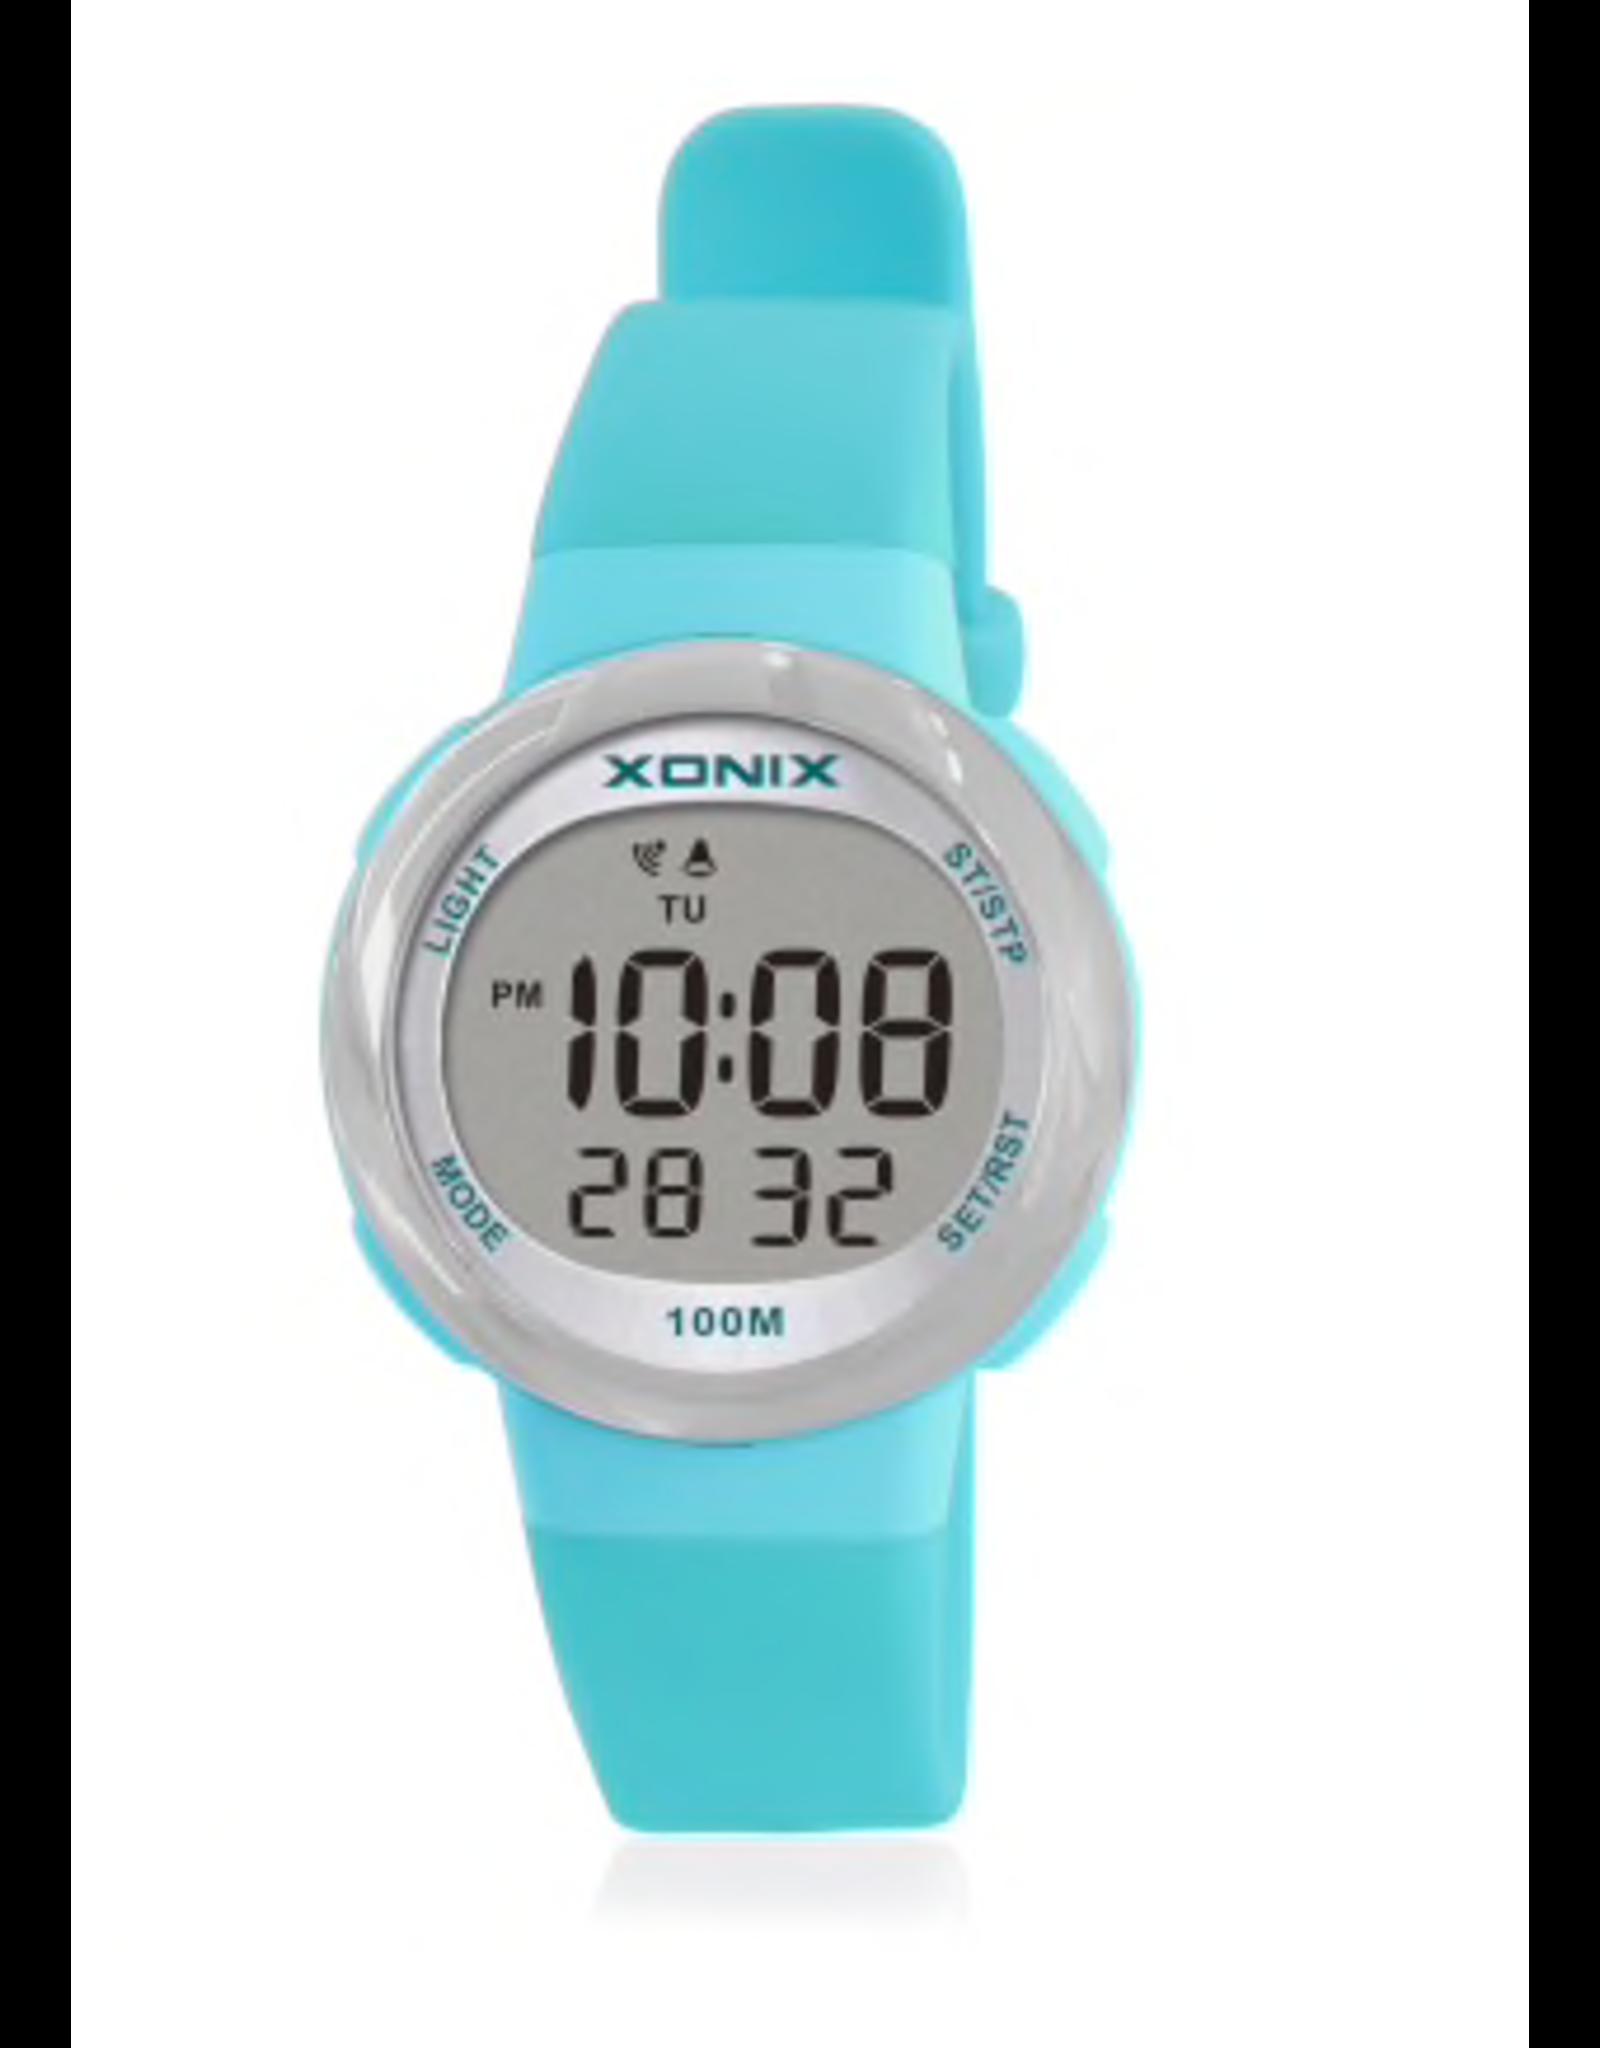 Xonix Petite turquoise ronde